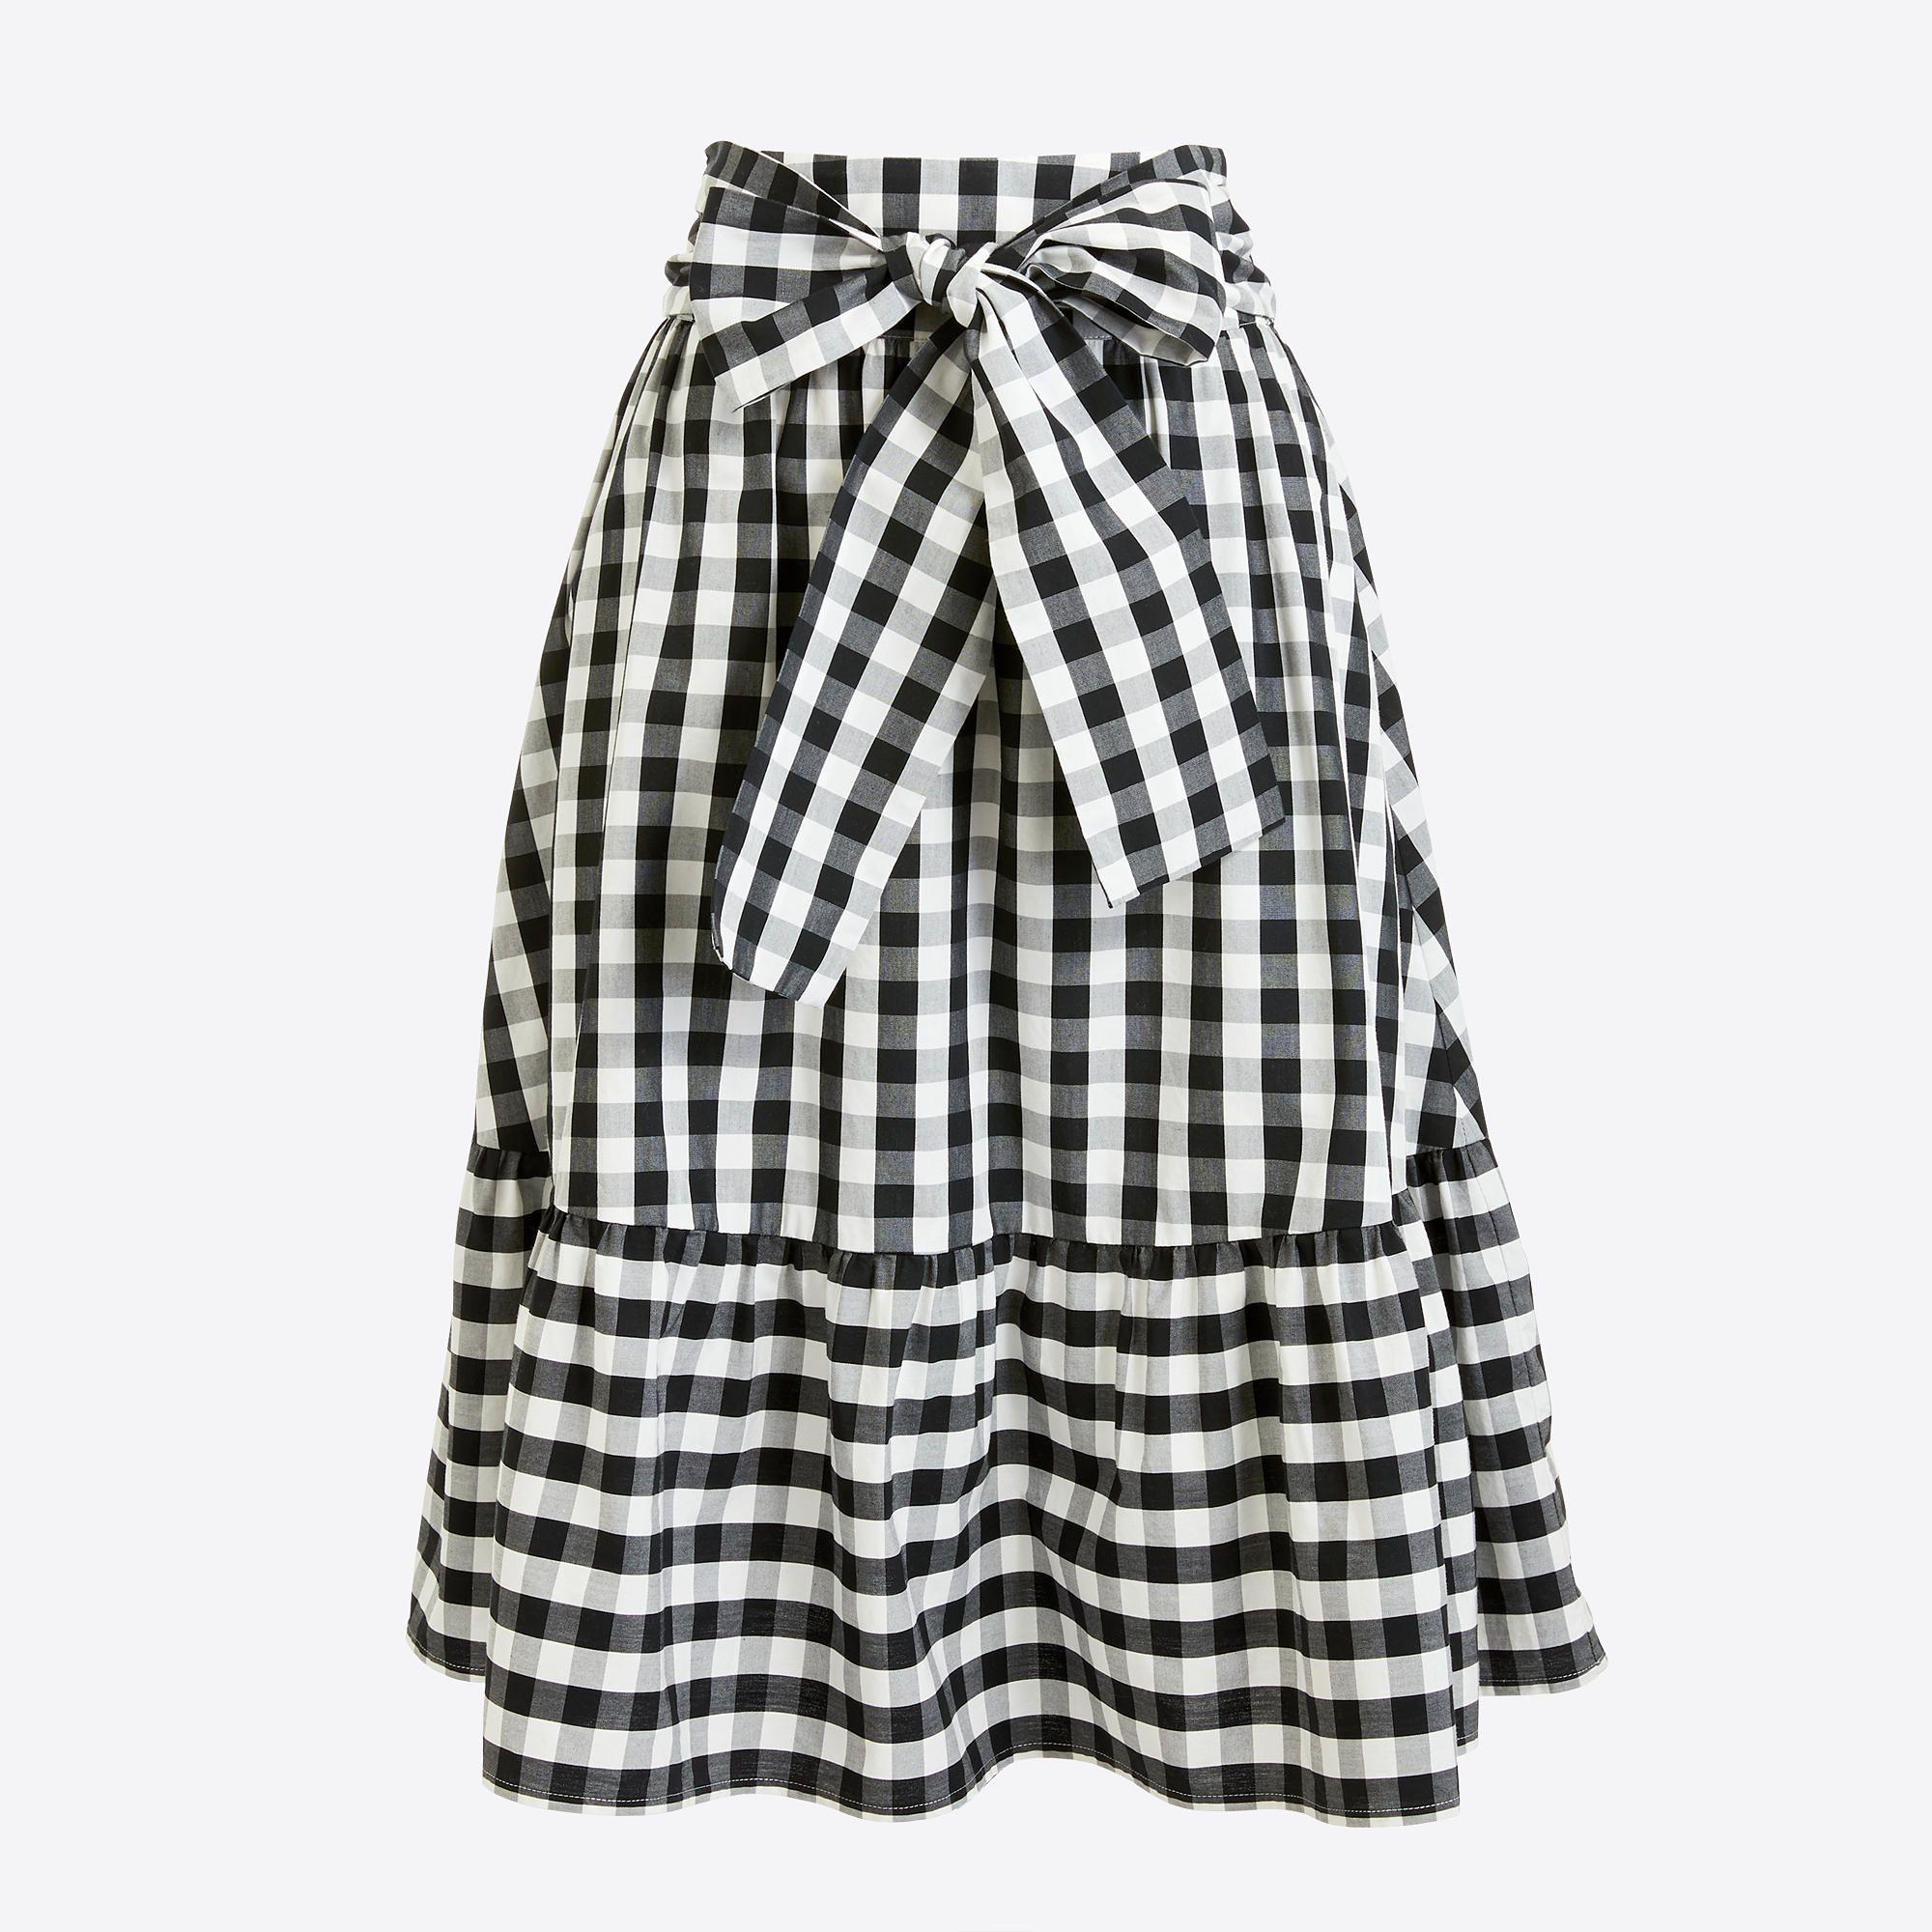 12b74f59c Tie-waist midi skirt   Apparel/Outfits   Fashion, Skirts, Midi skirt ...